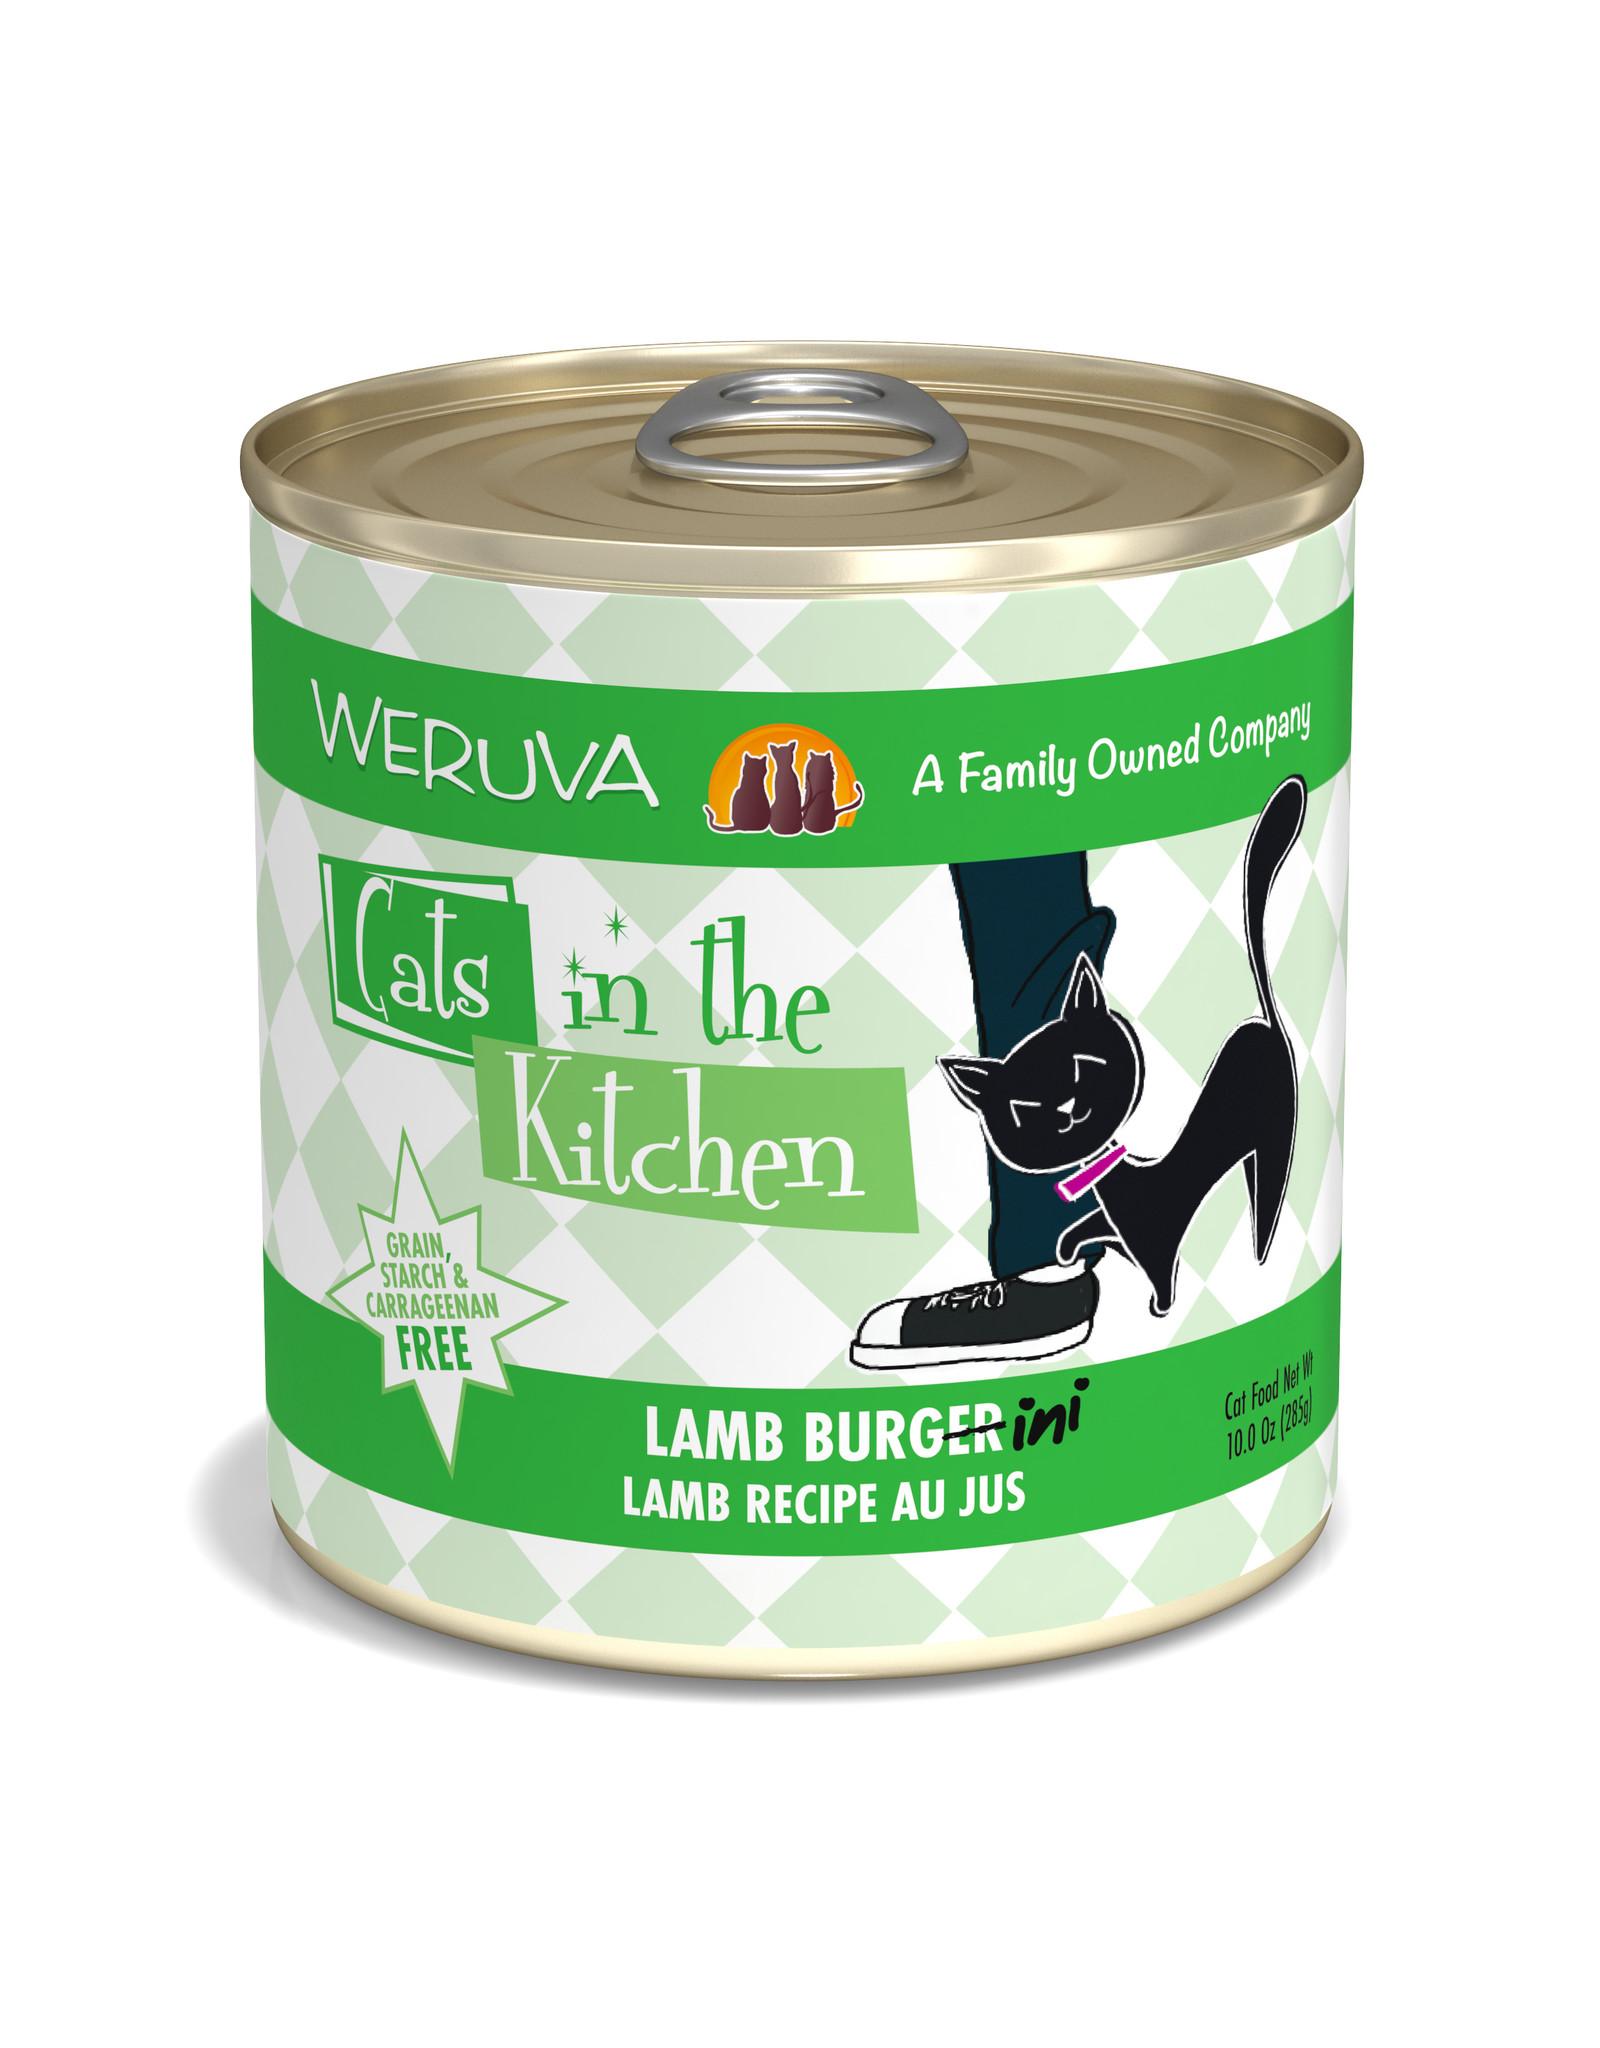 Weruva WERUVA CAT CATS IN THE KITCHEN LAMB BURGER-INI LAMB RECIPE AU JUS